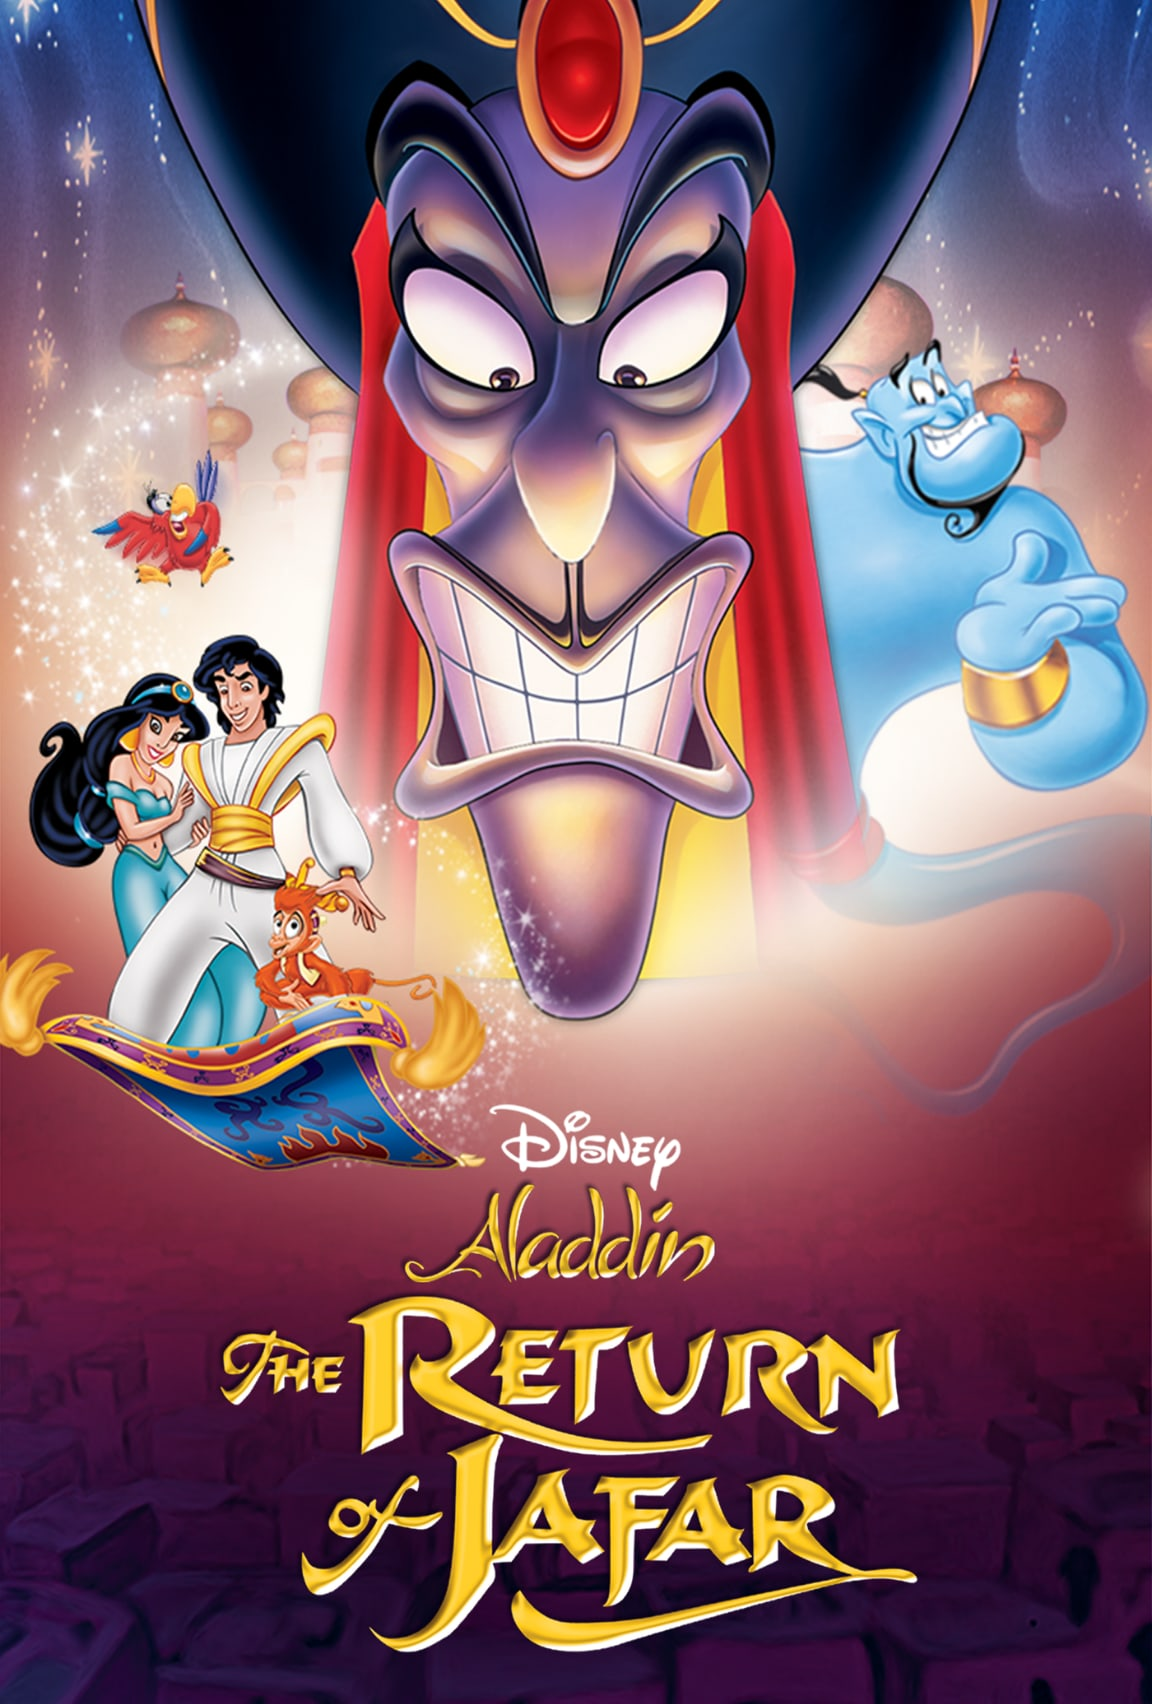 Aladdin: The Return of Jafar (1994)